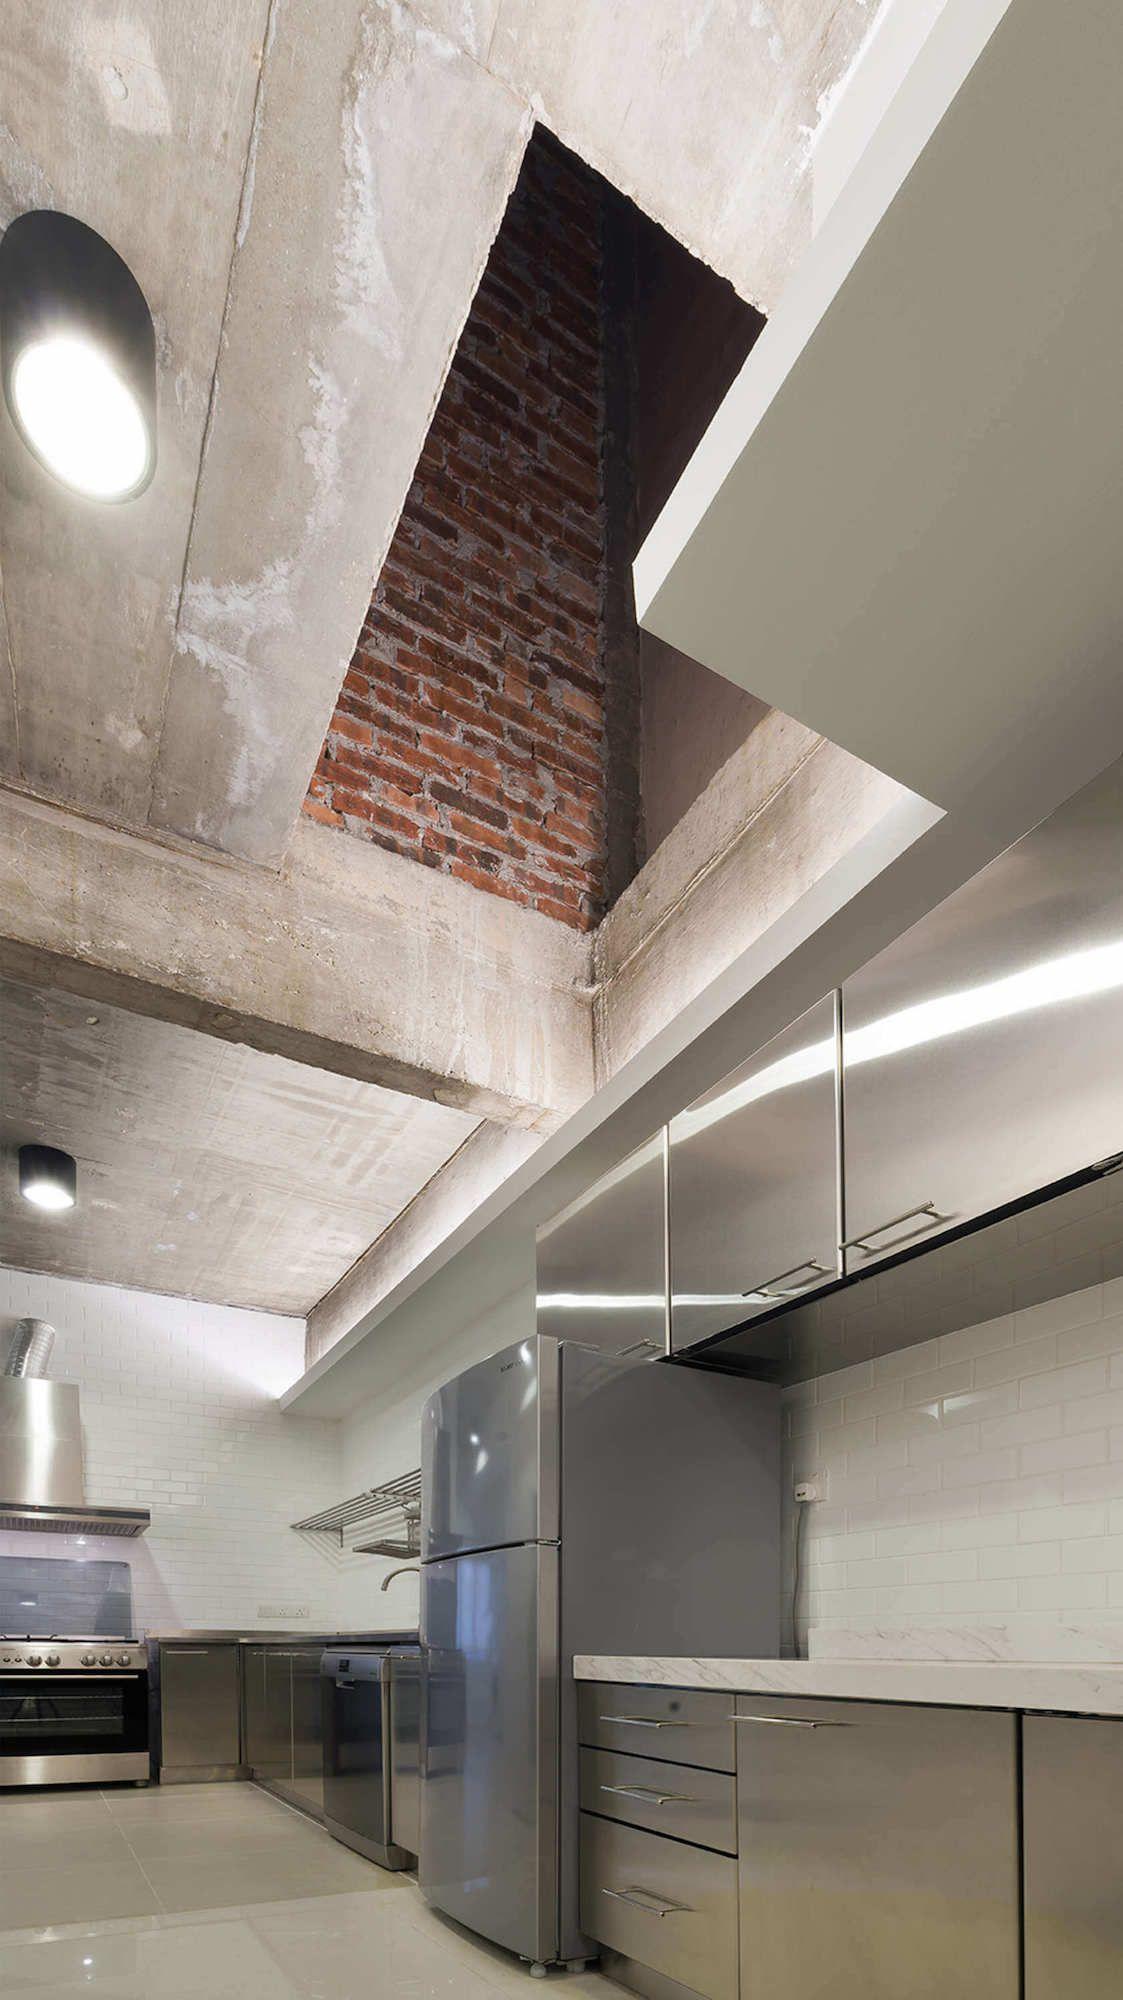 kuala-lumpur-home-drtan-lm-architect-13